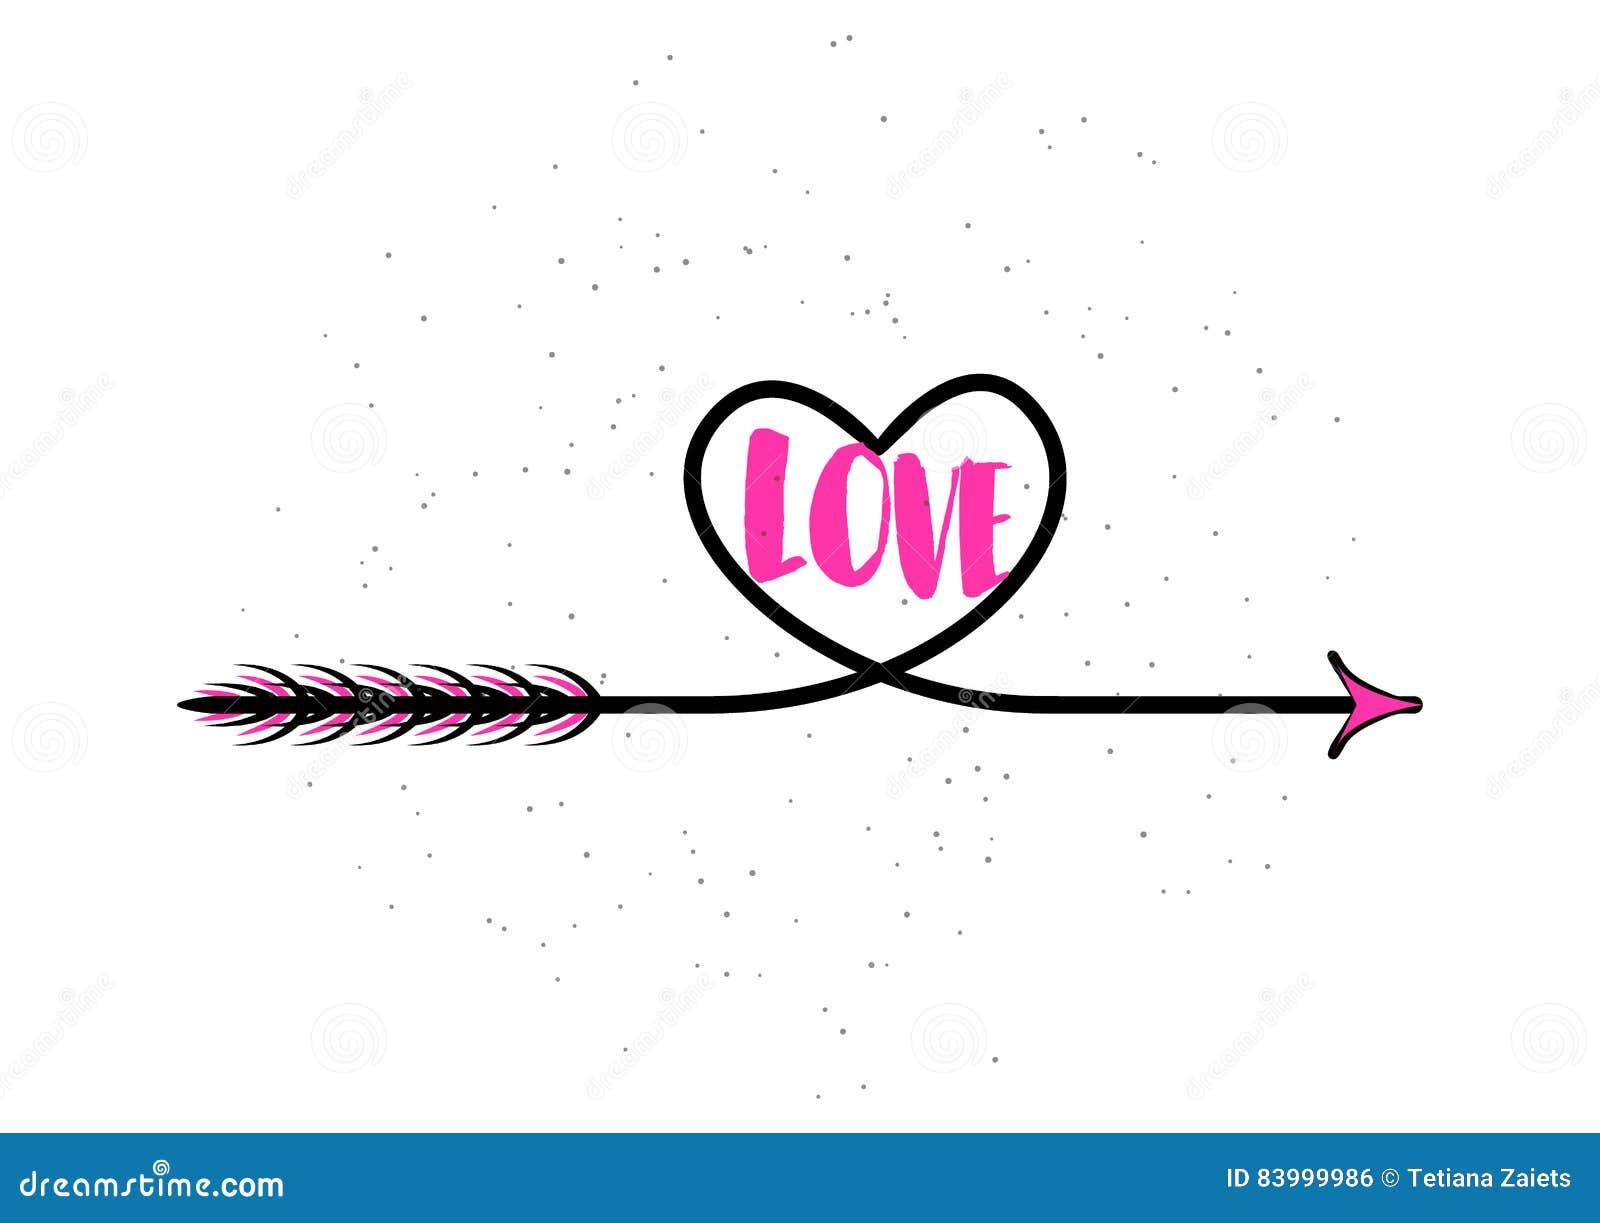 vector illustration of typography word sign love heart arrow stock rh dreamstime com vector arrow word Vintage Arrow Vector